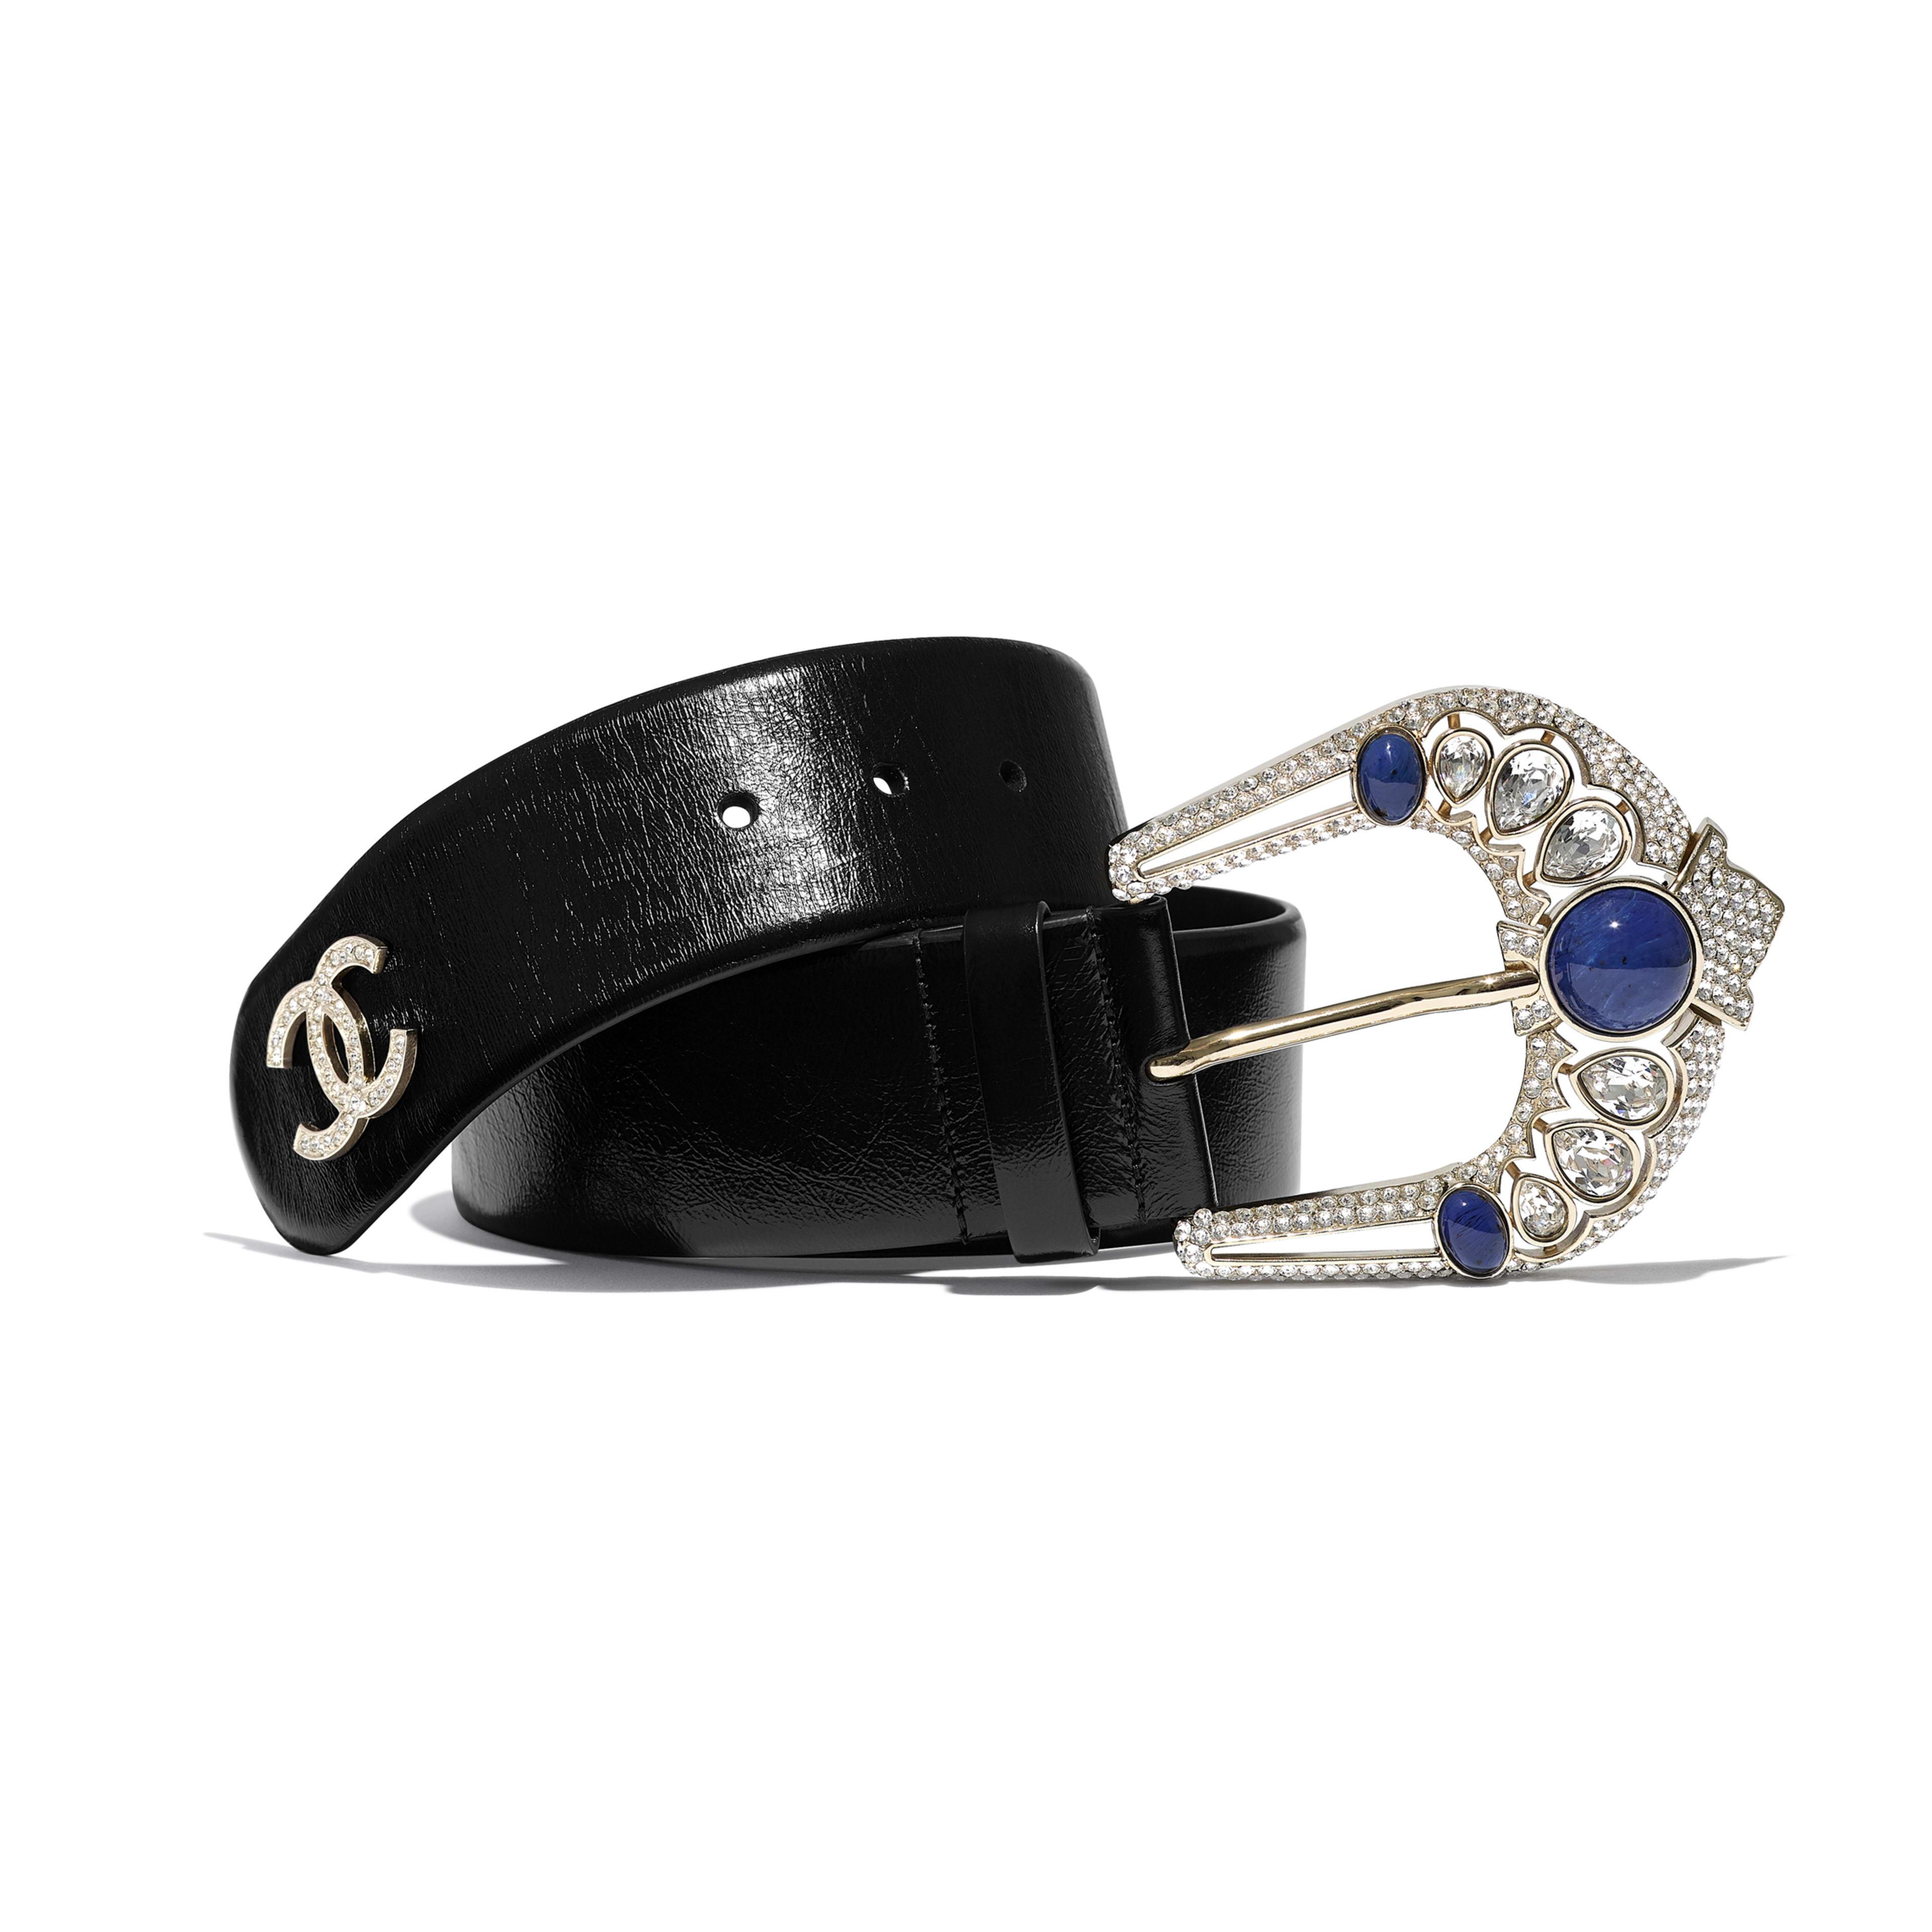 Belt - Black & Blue - Calfskin, Gold-Tone Metal, Strass & Resin - Default view - see full sized version